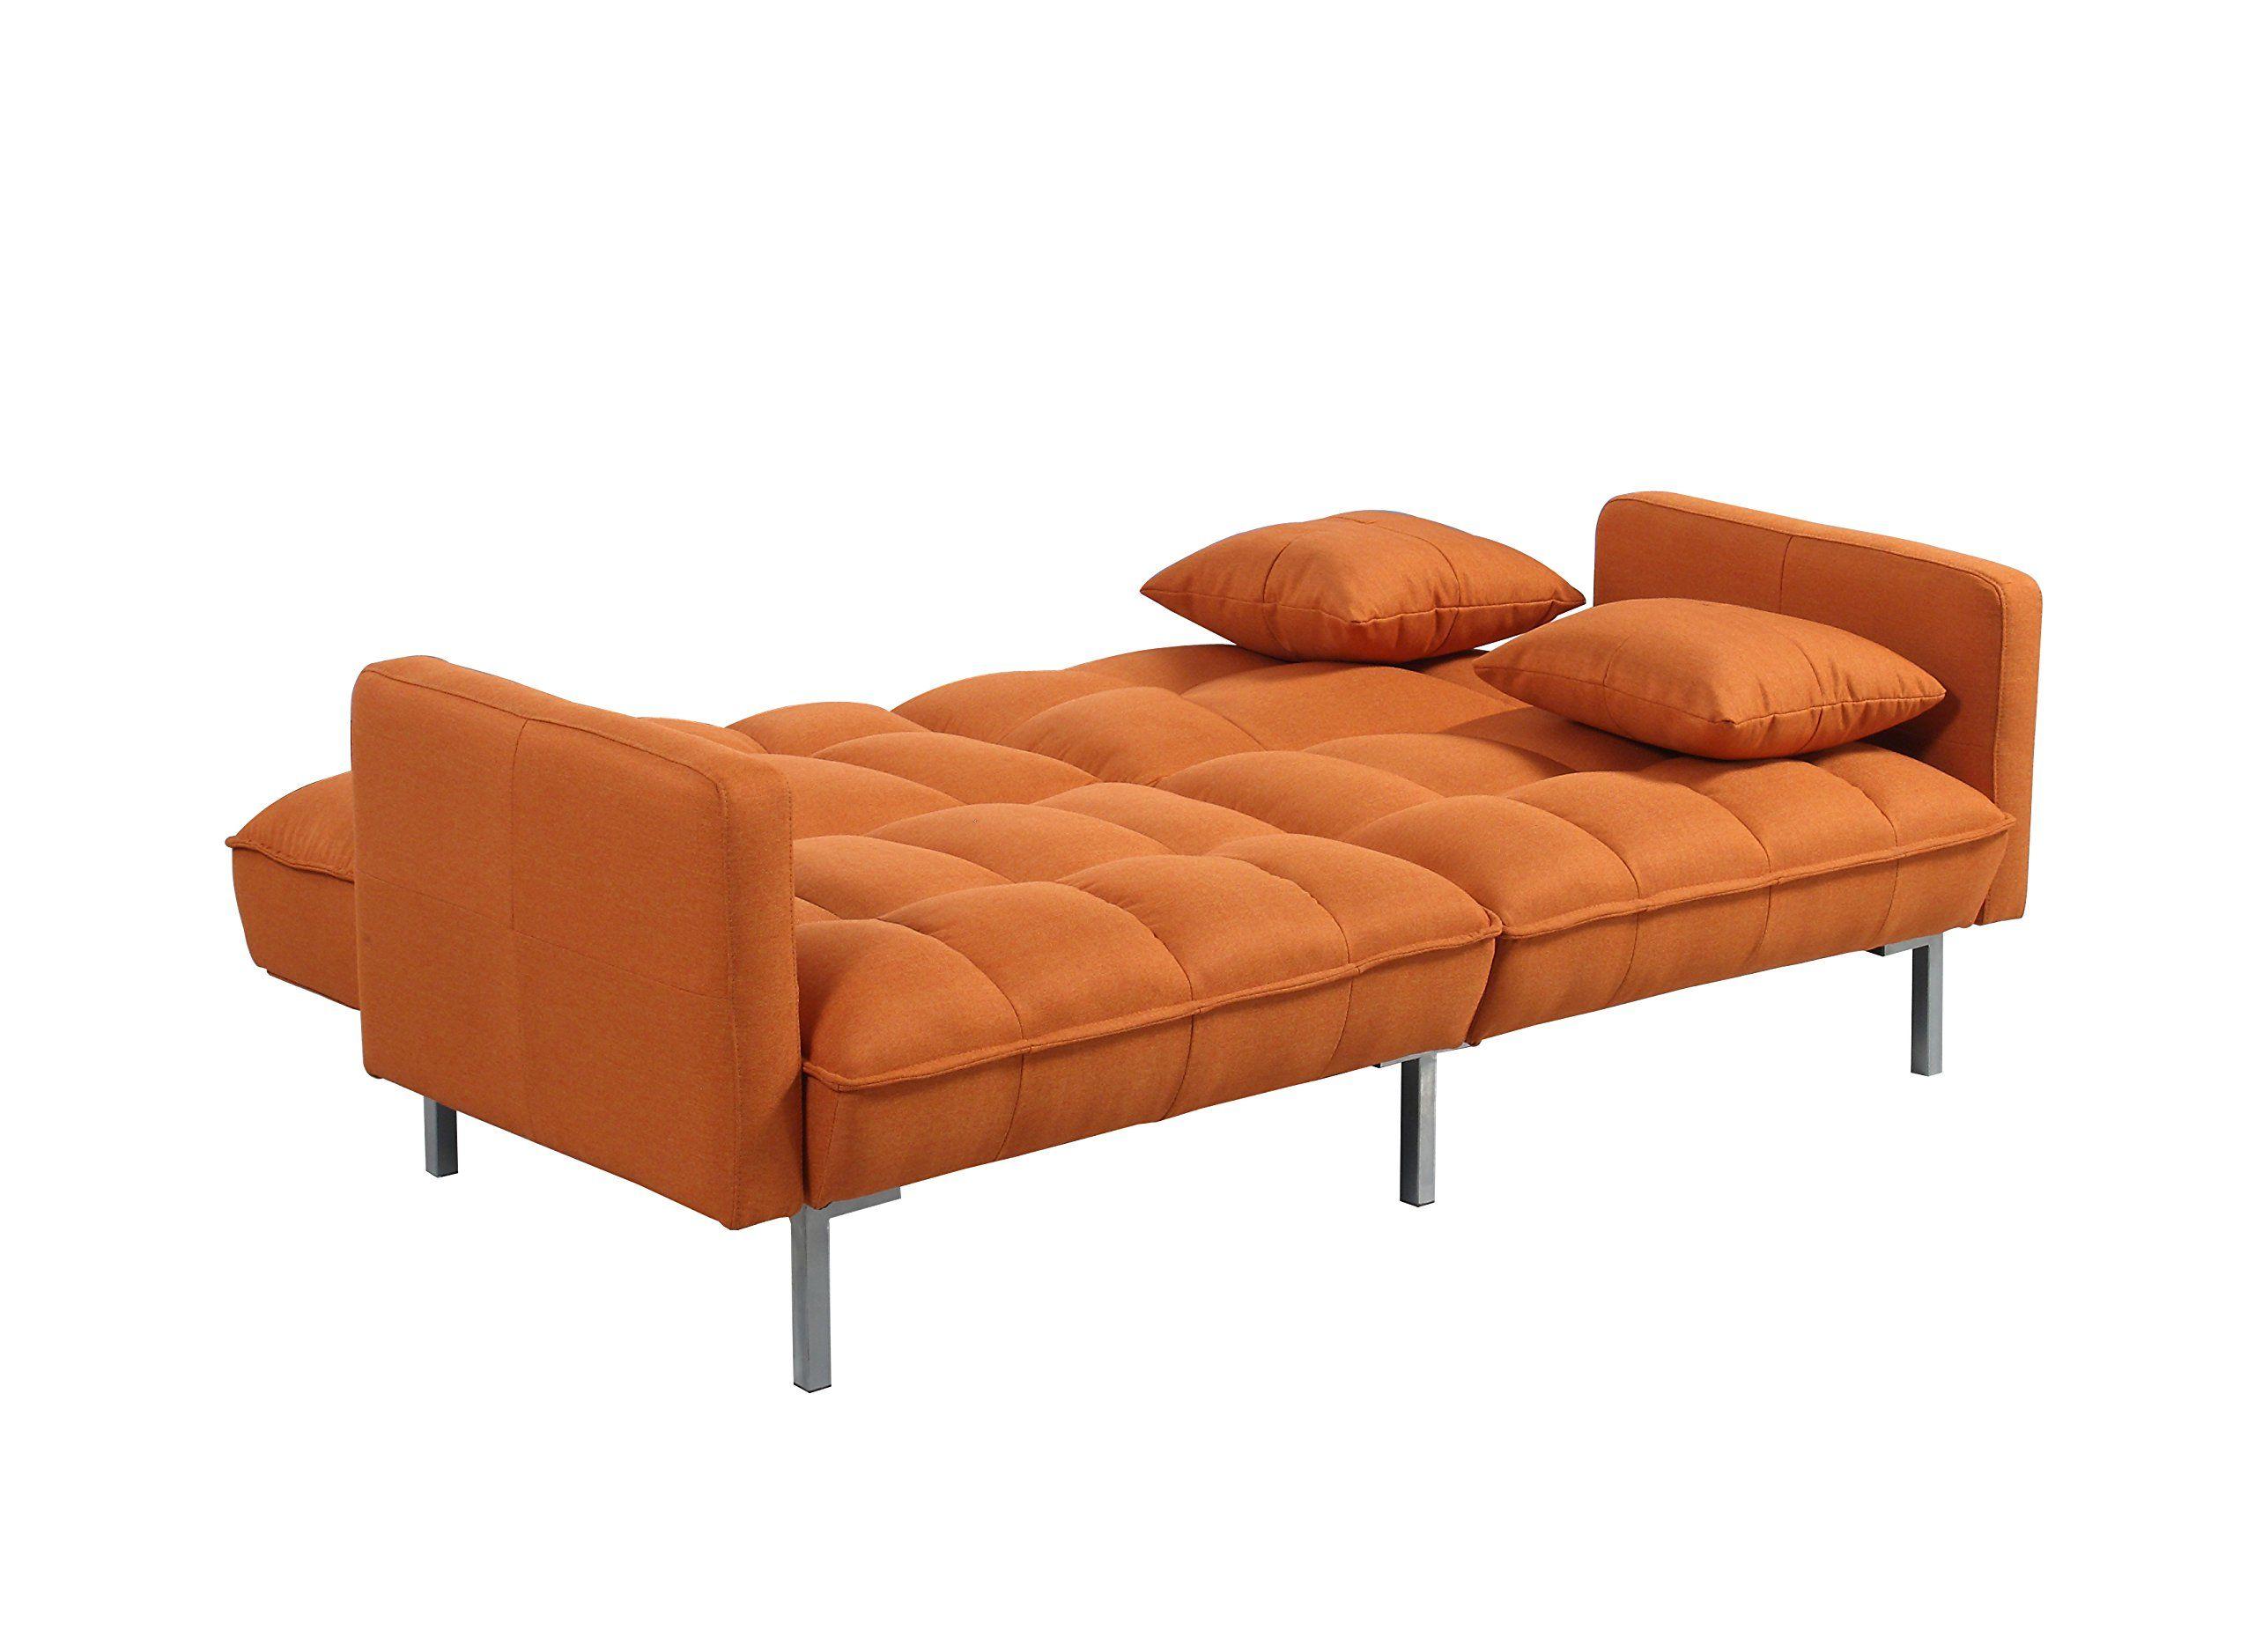 Divano Roma Furniture Collection Modern Plush Tufted Linen